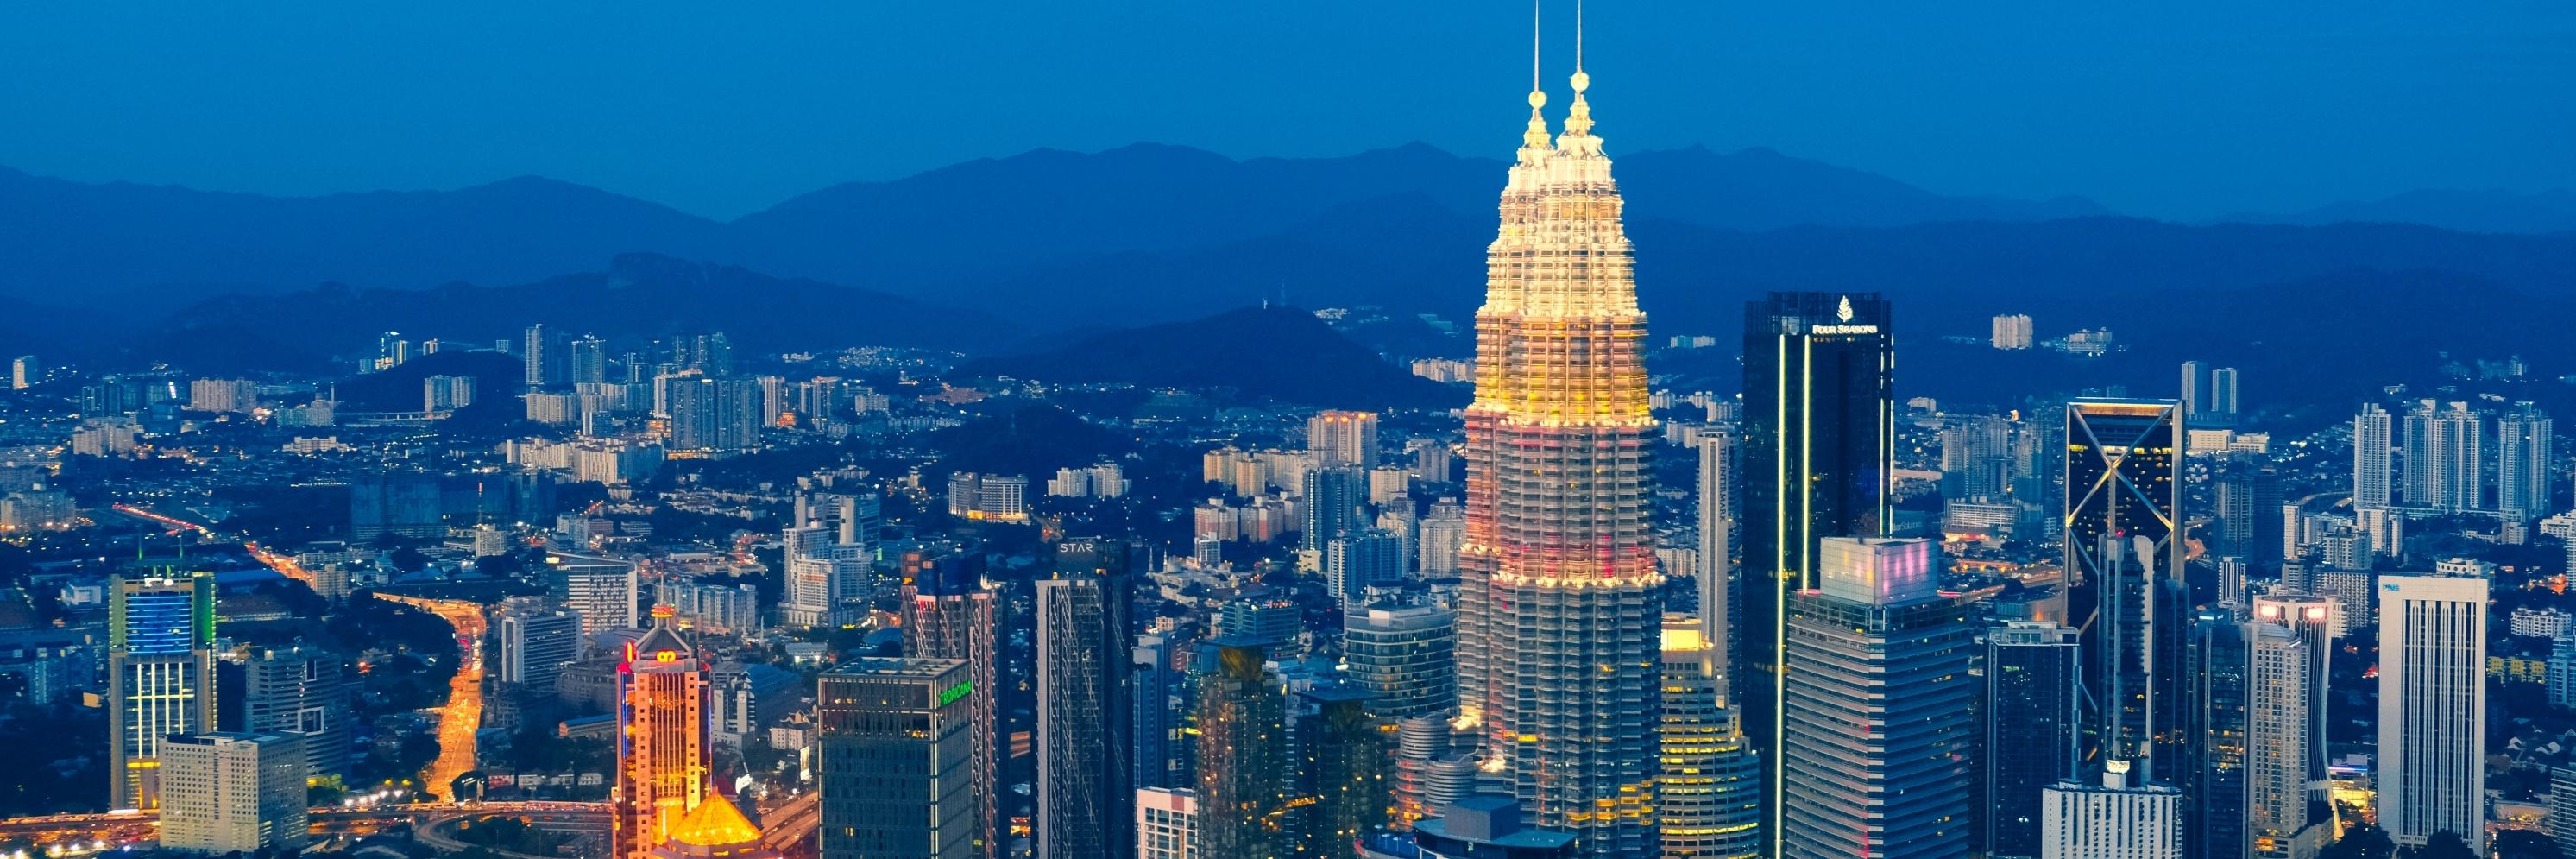 https://gody.vn/blog/tuananhhunre9193/post/tan-man-ve-malaysia-4804